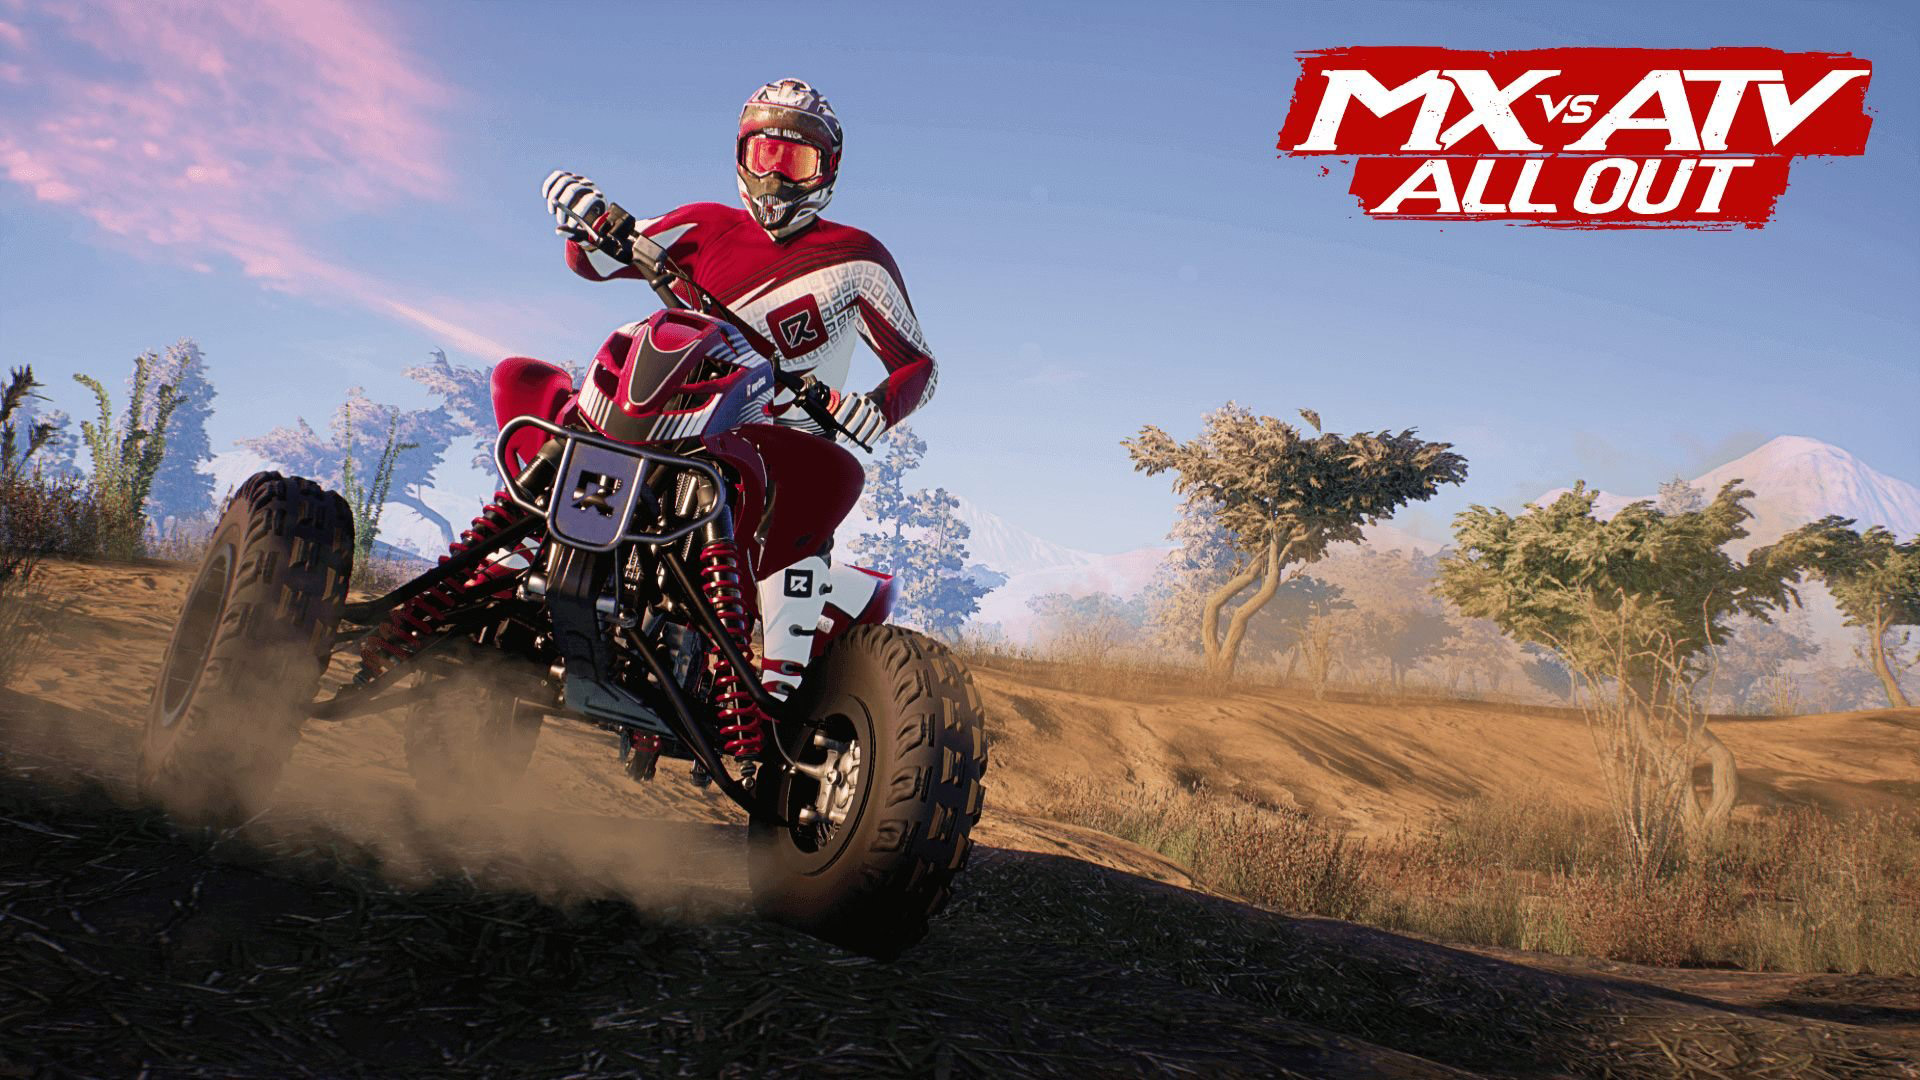 MX vs ATV All Out Wallpaper in 1920x1080